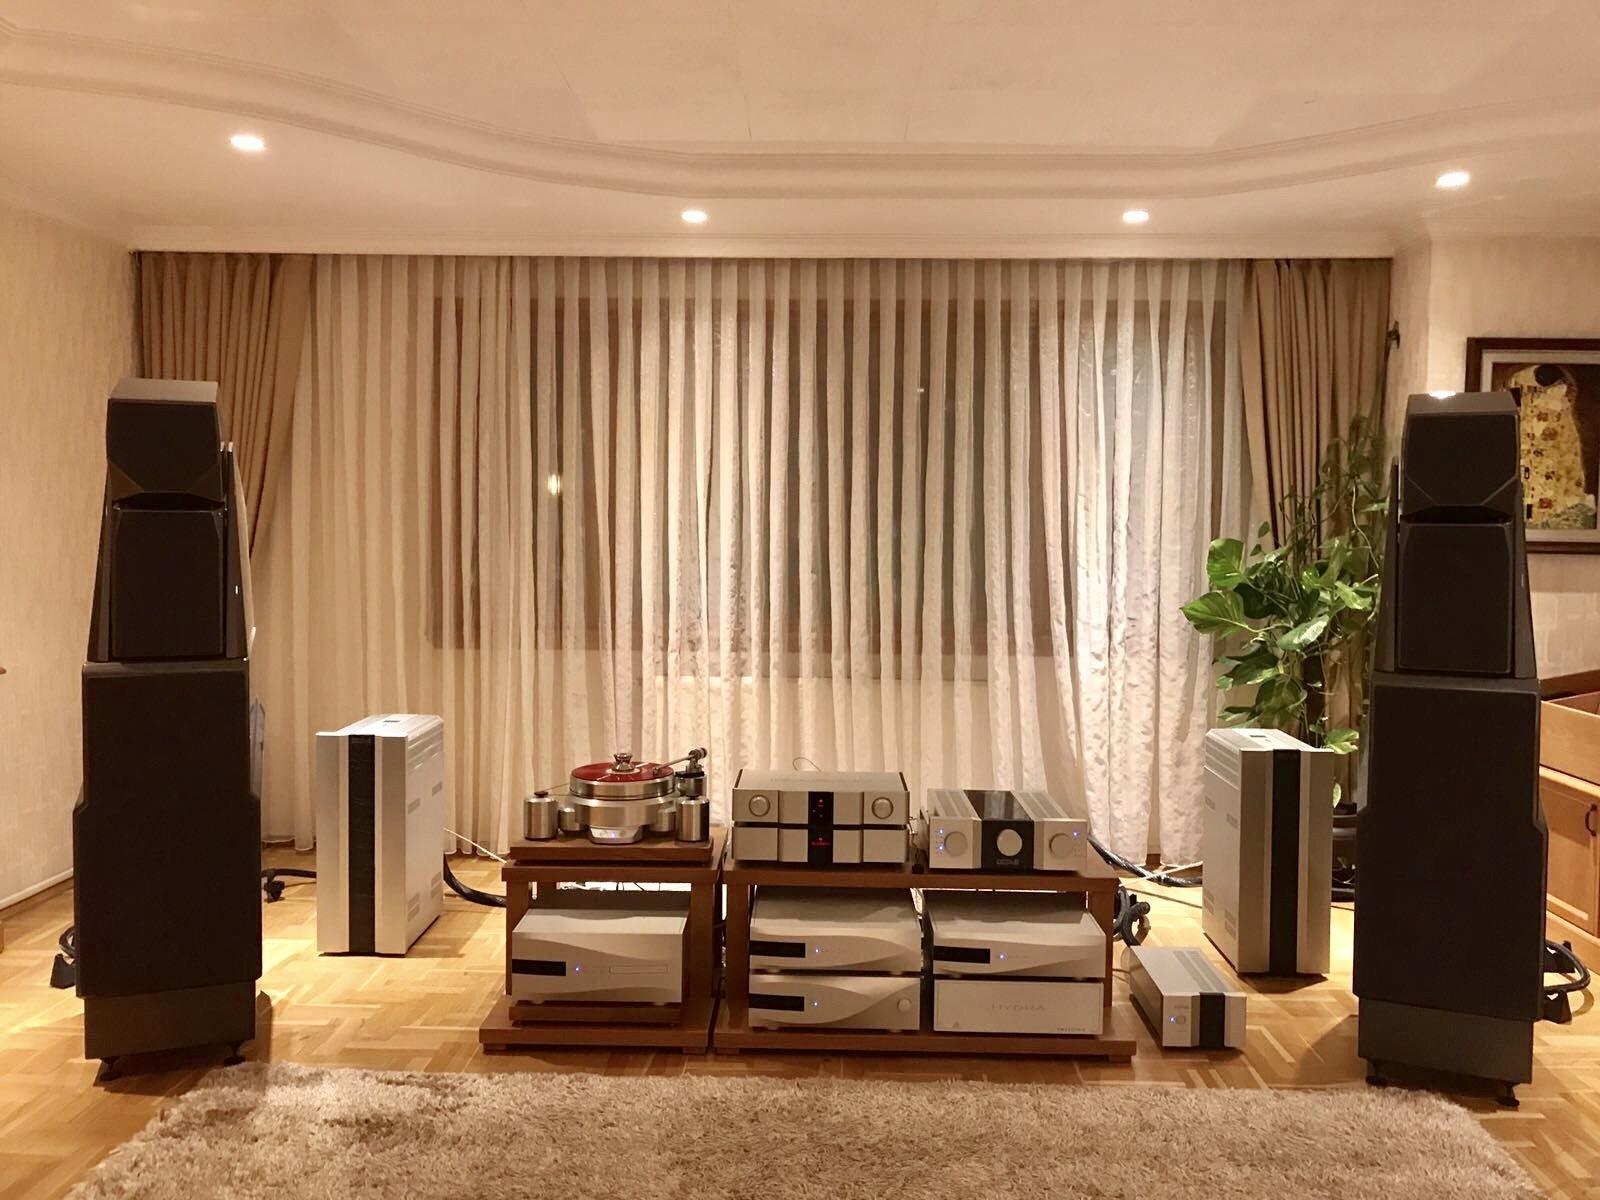 Wilson Audio Maxx3 + KA PH Ref